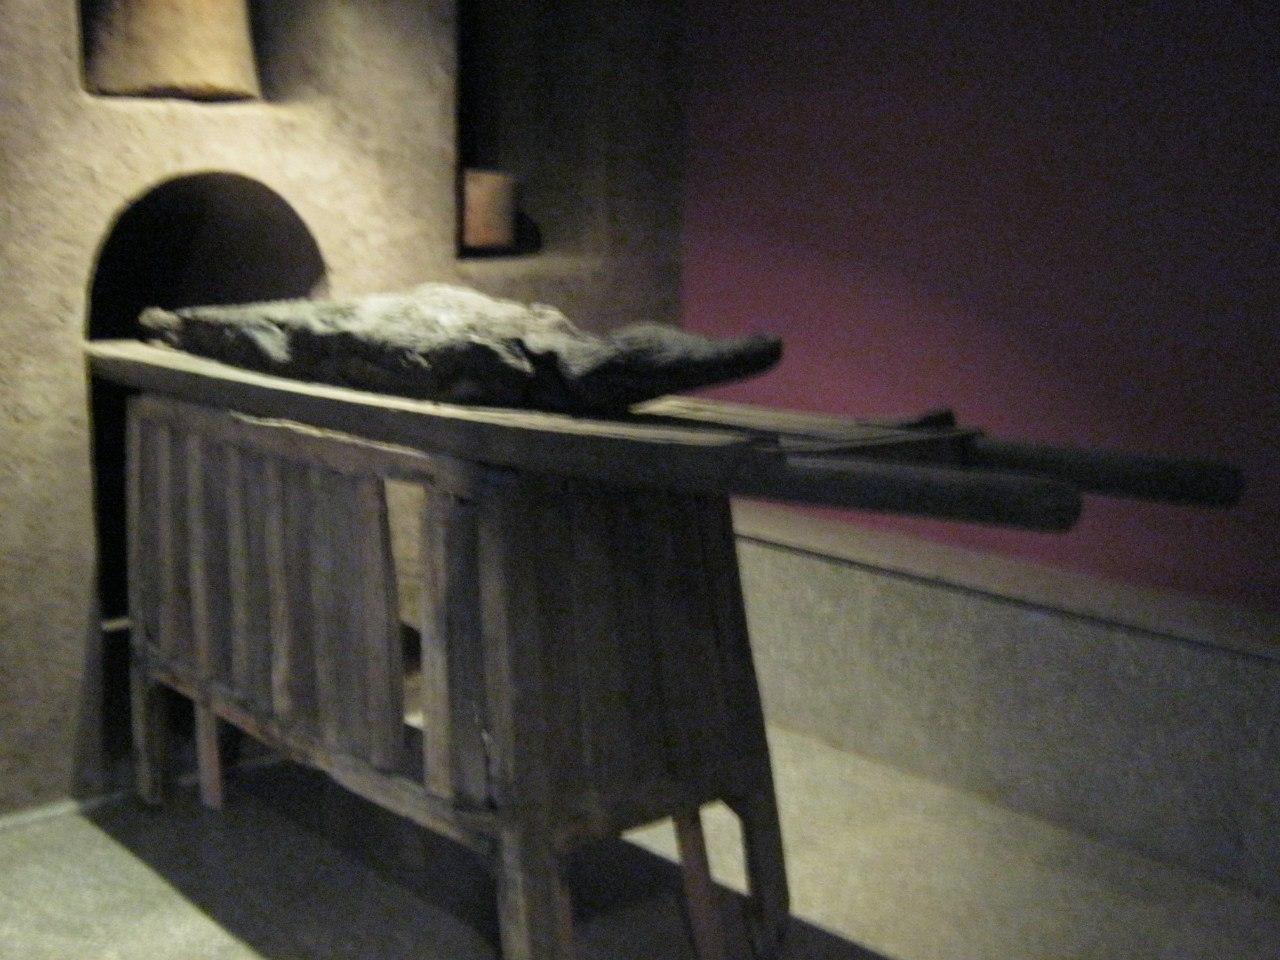 Захоронение крокодила в музее при храме Ком Омбо